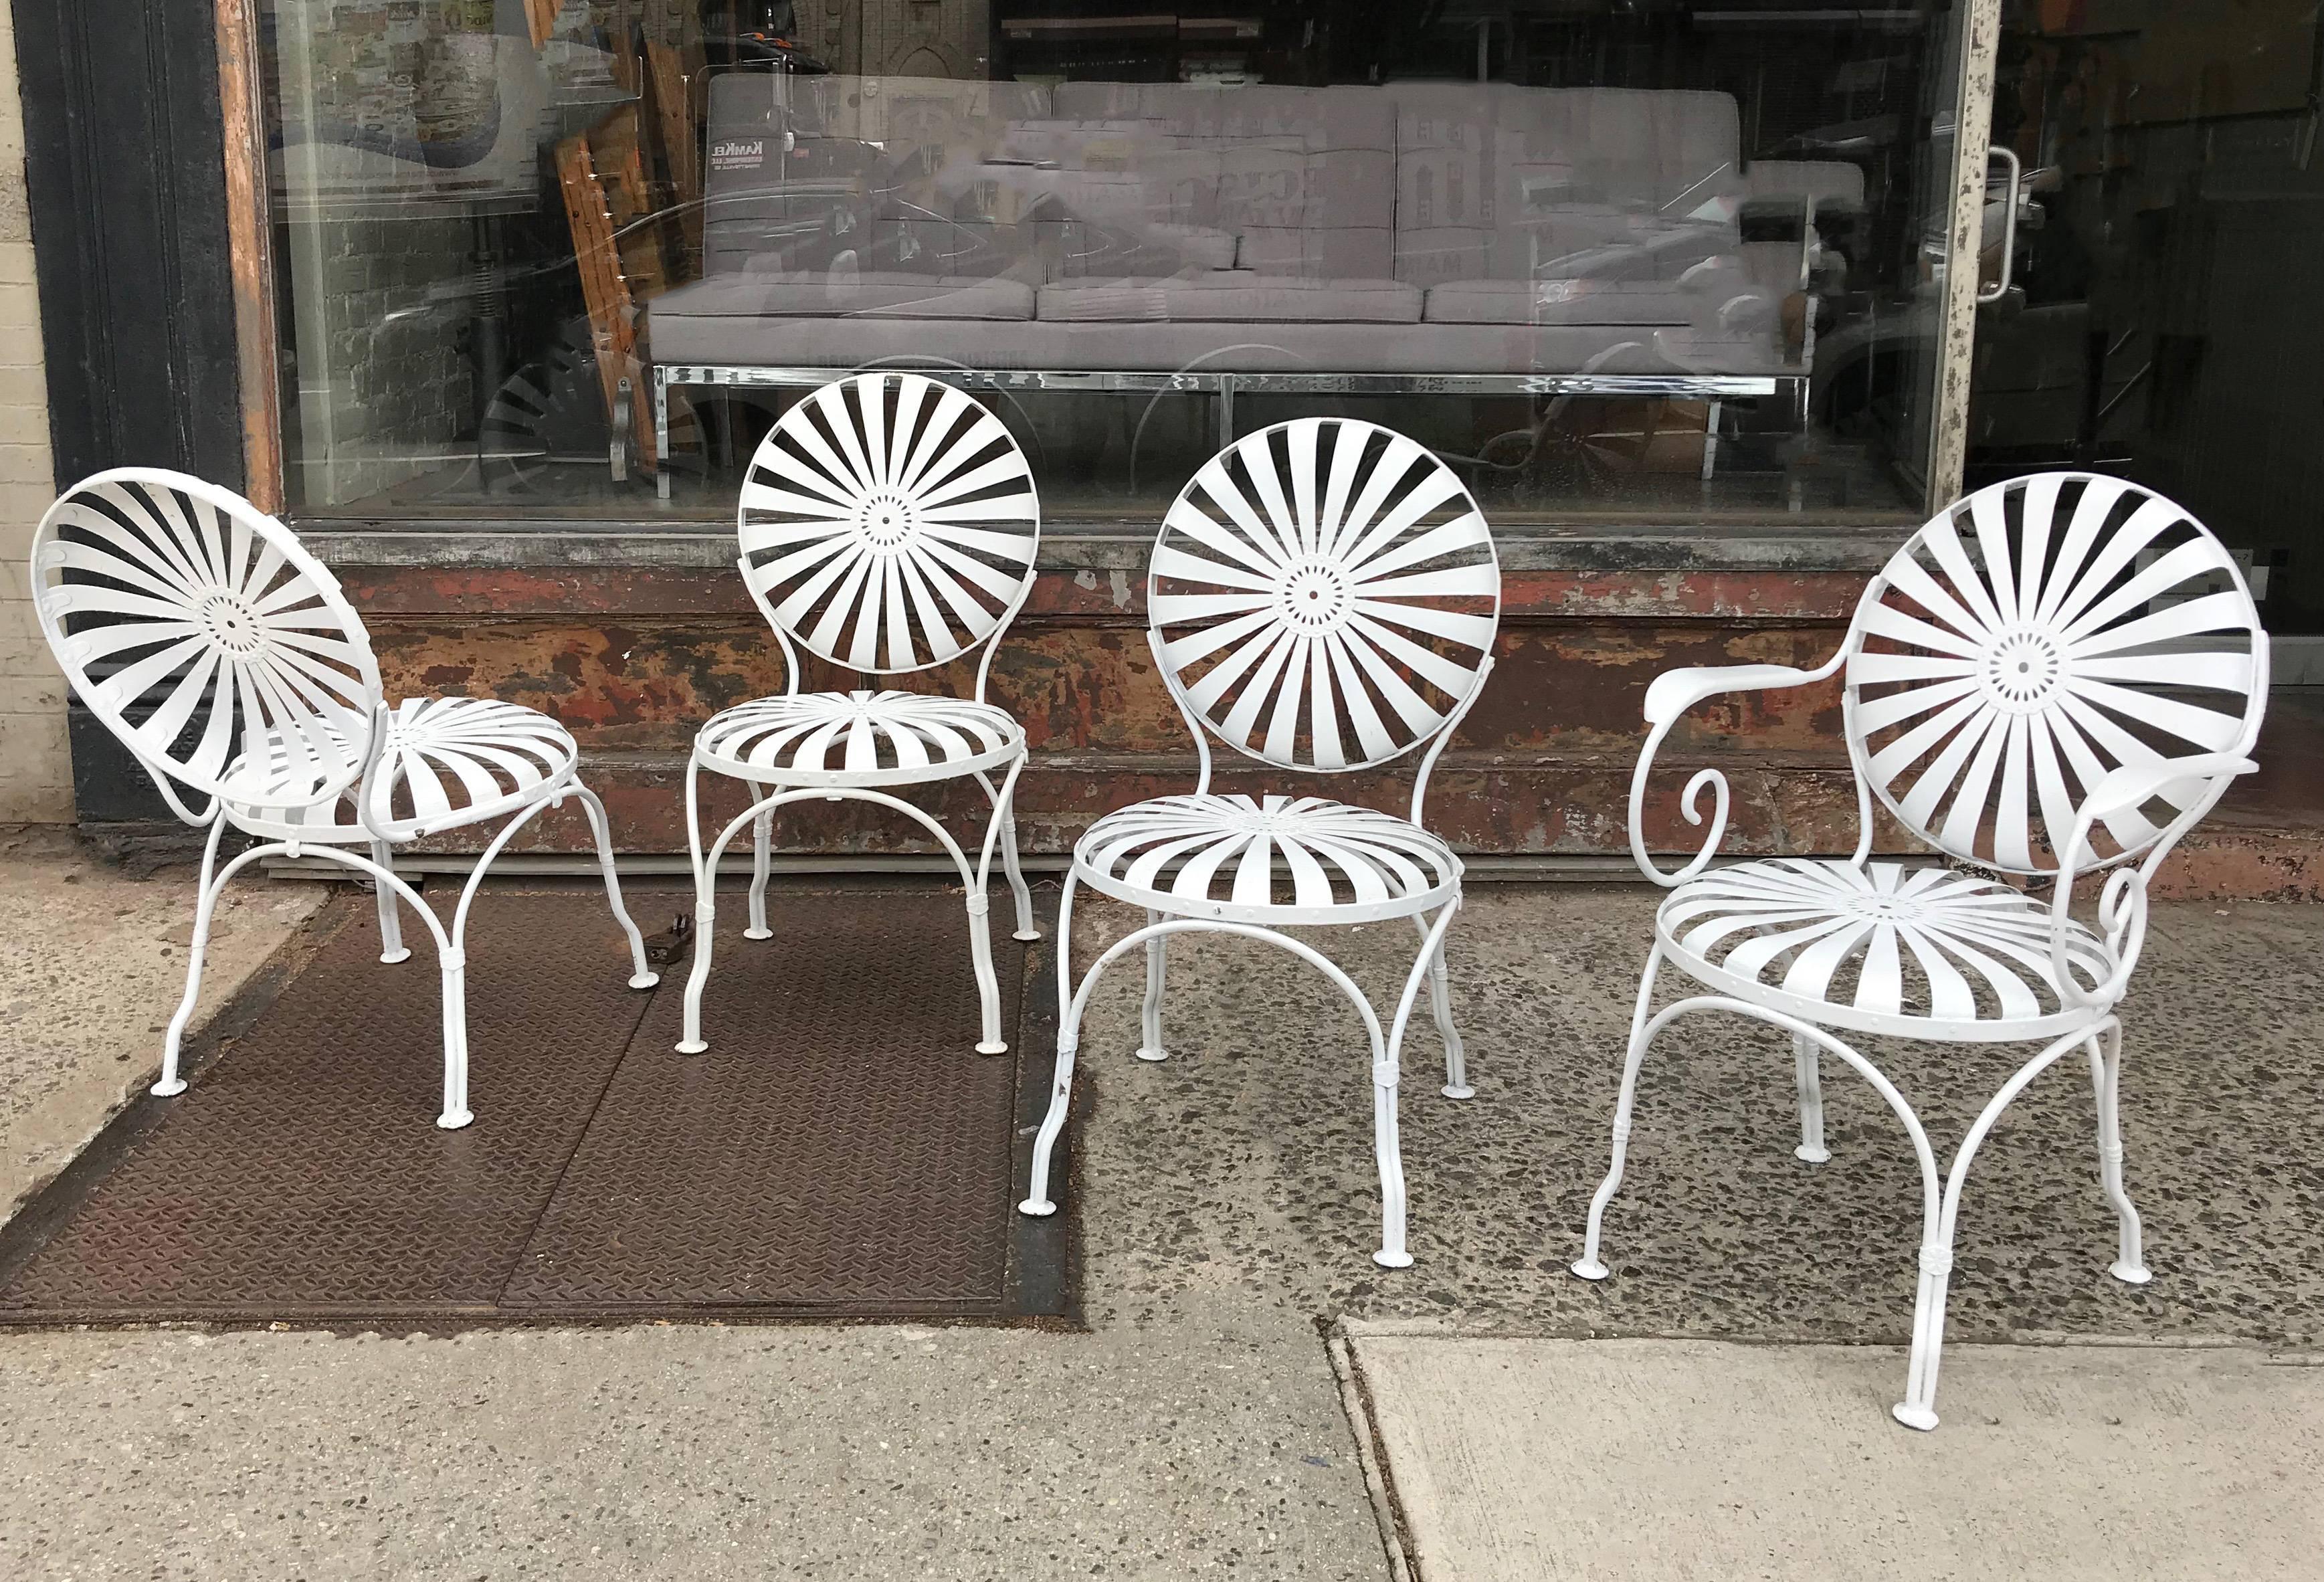 art deco francois carr wrought iron sunburst outdoor patio chair rh 1stdibs com pavilion sunburst outdoor furniture